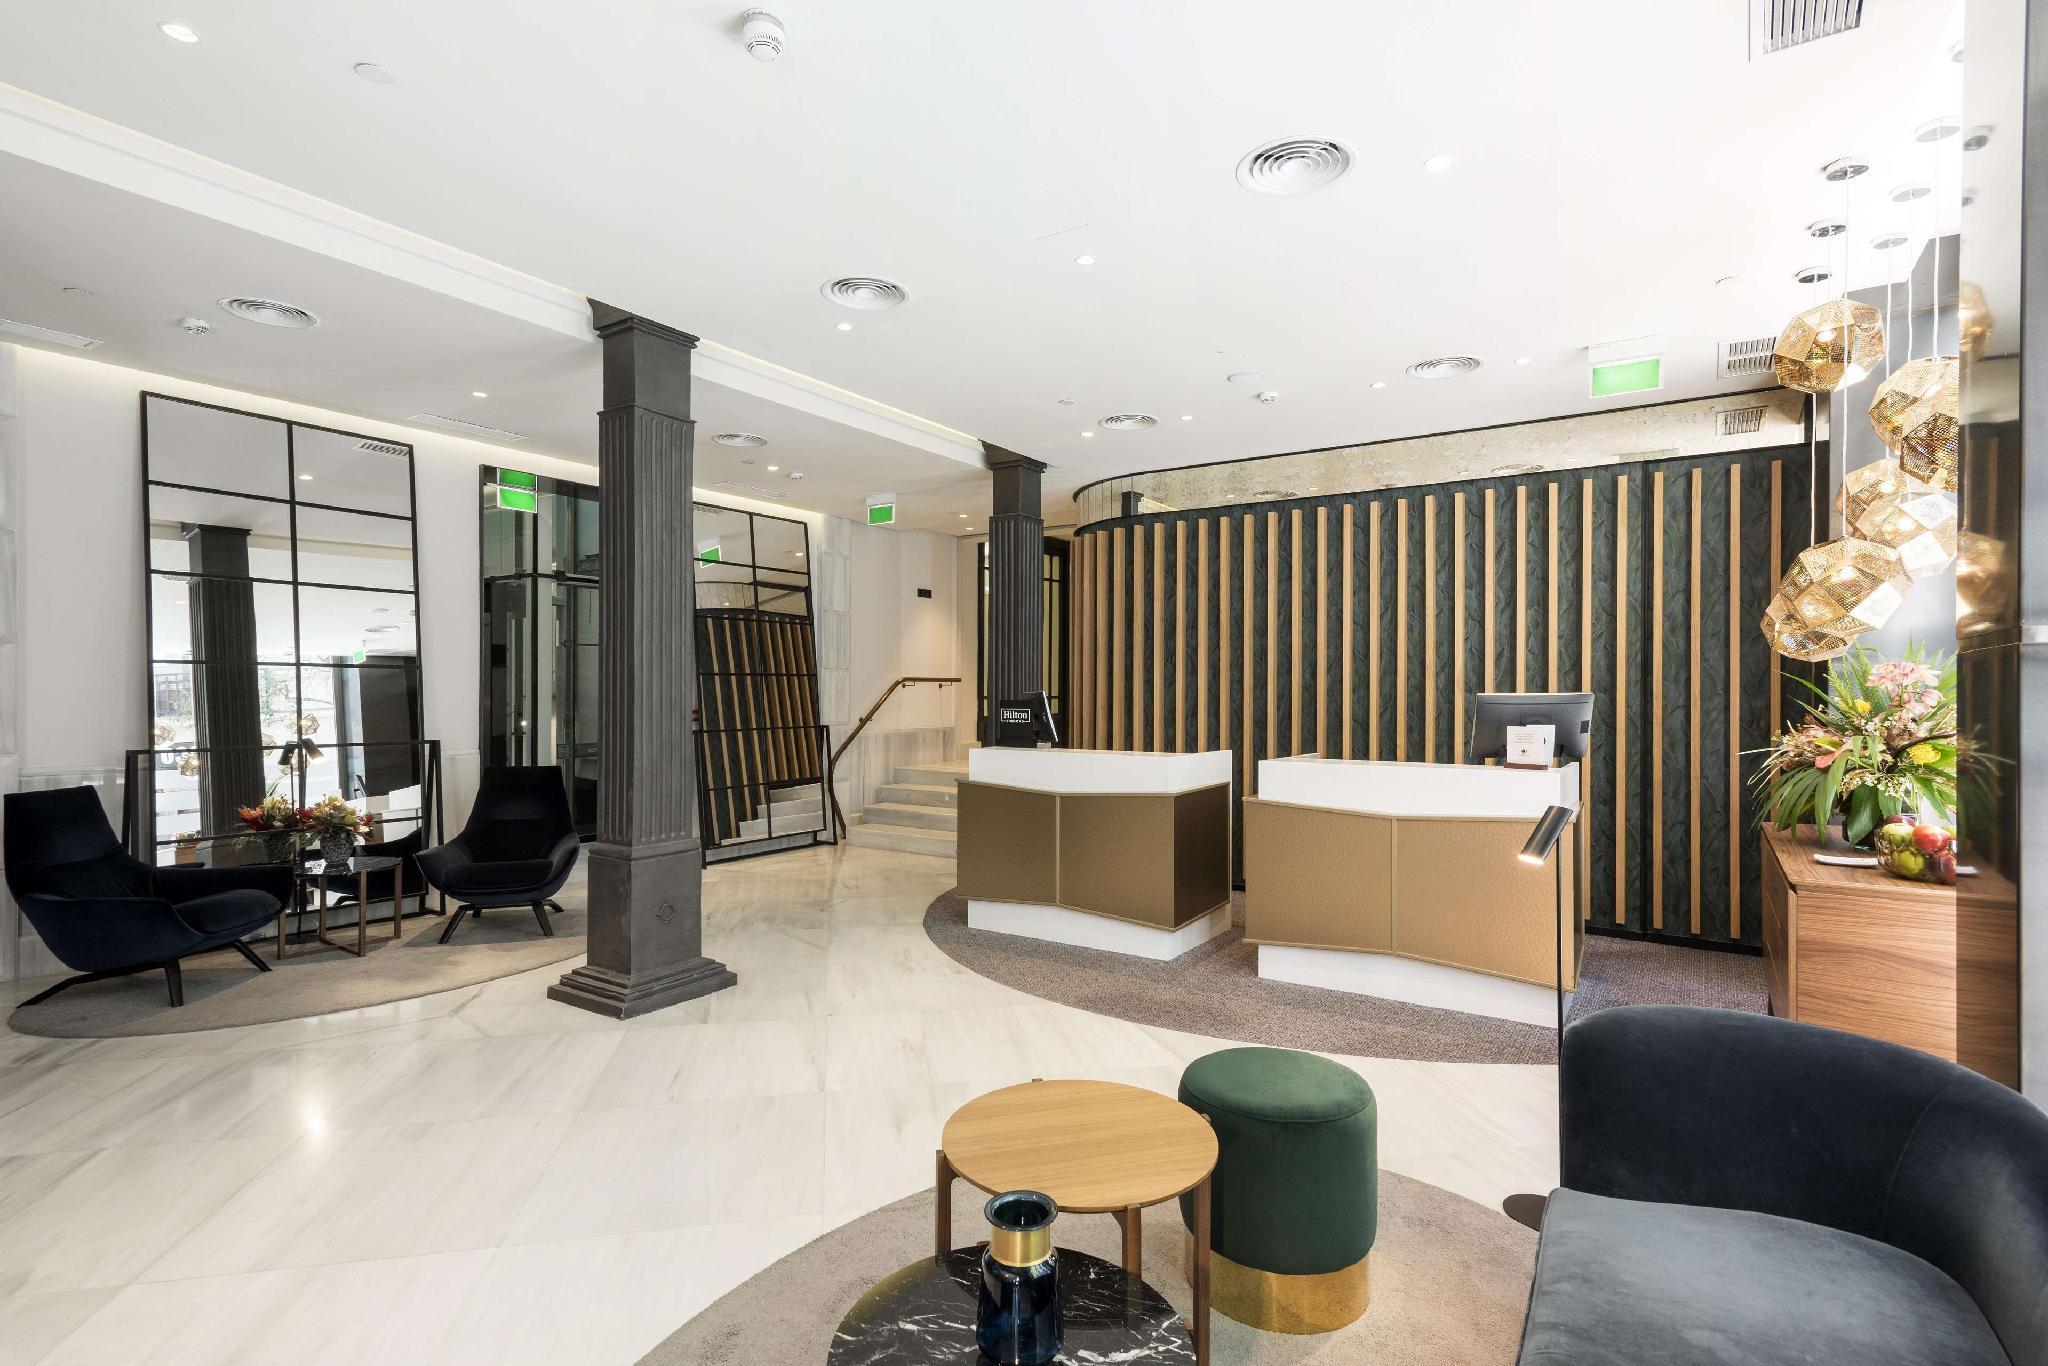 Doubletree By Hilton Madrid Prado Hotel Deals Photos